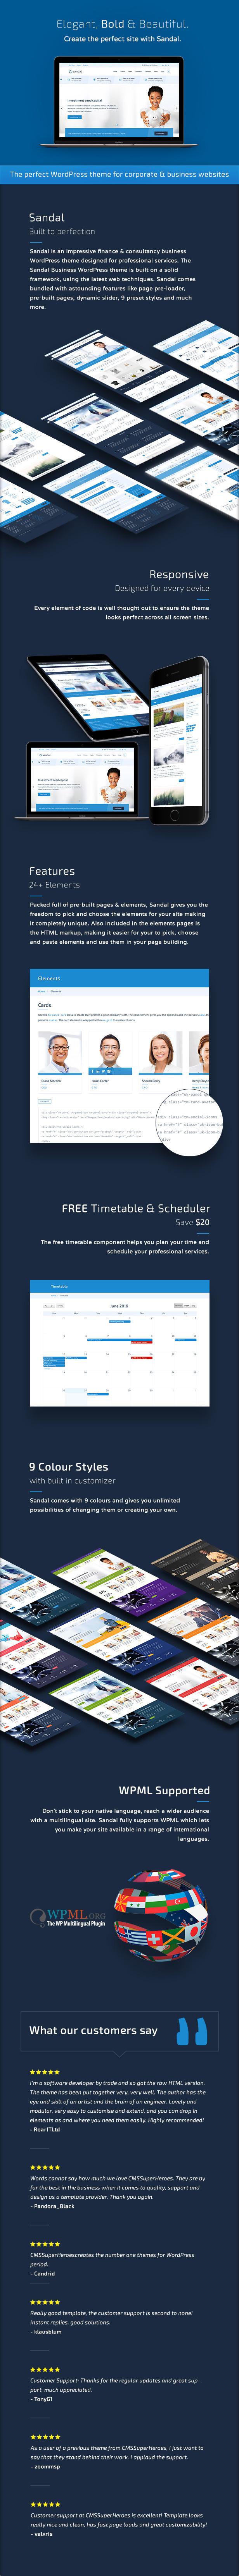 Sandal - Finance & Consultancy Business WordPress Theme - 1